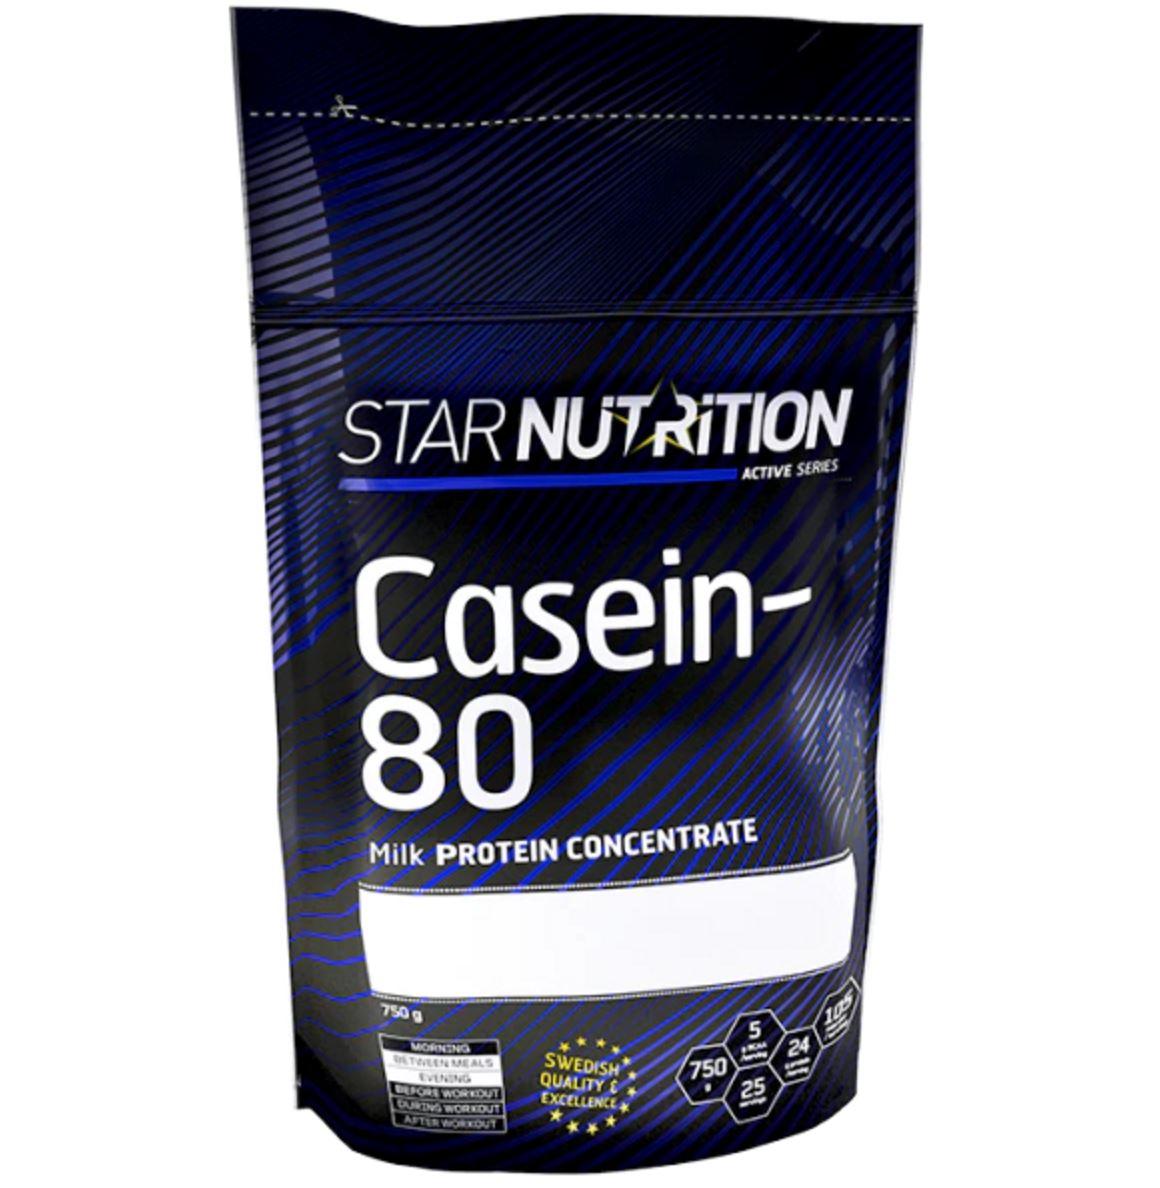 Kasein proteinpulver för kvinnor